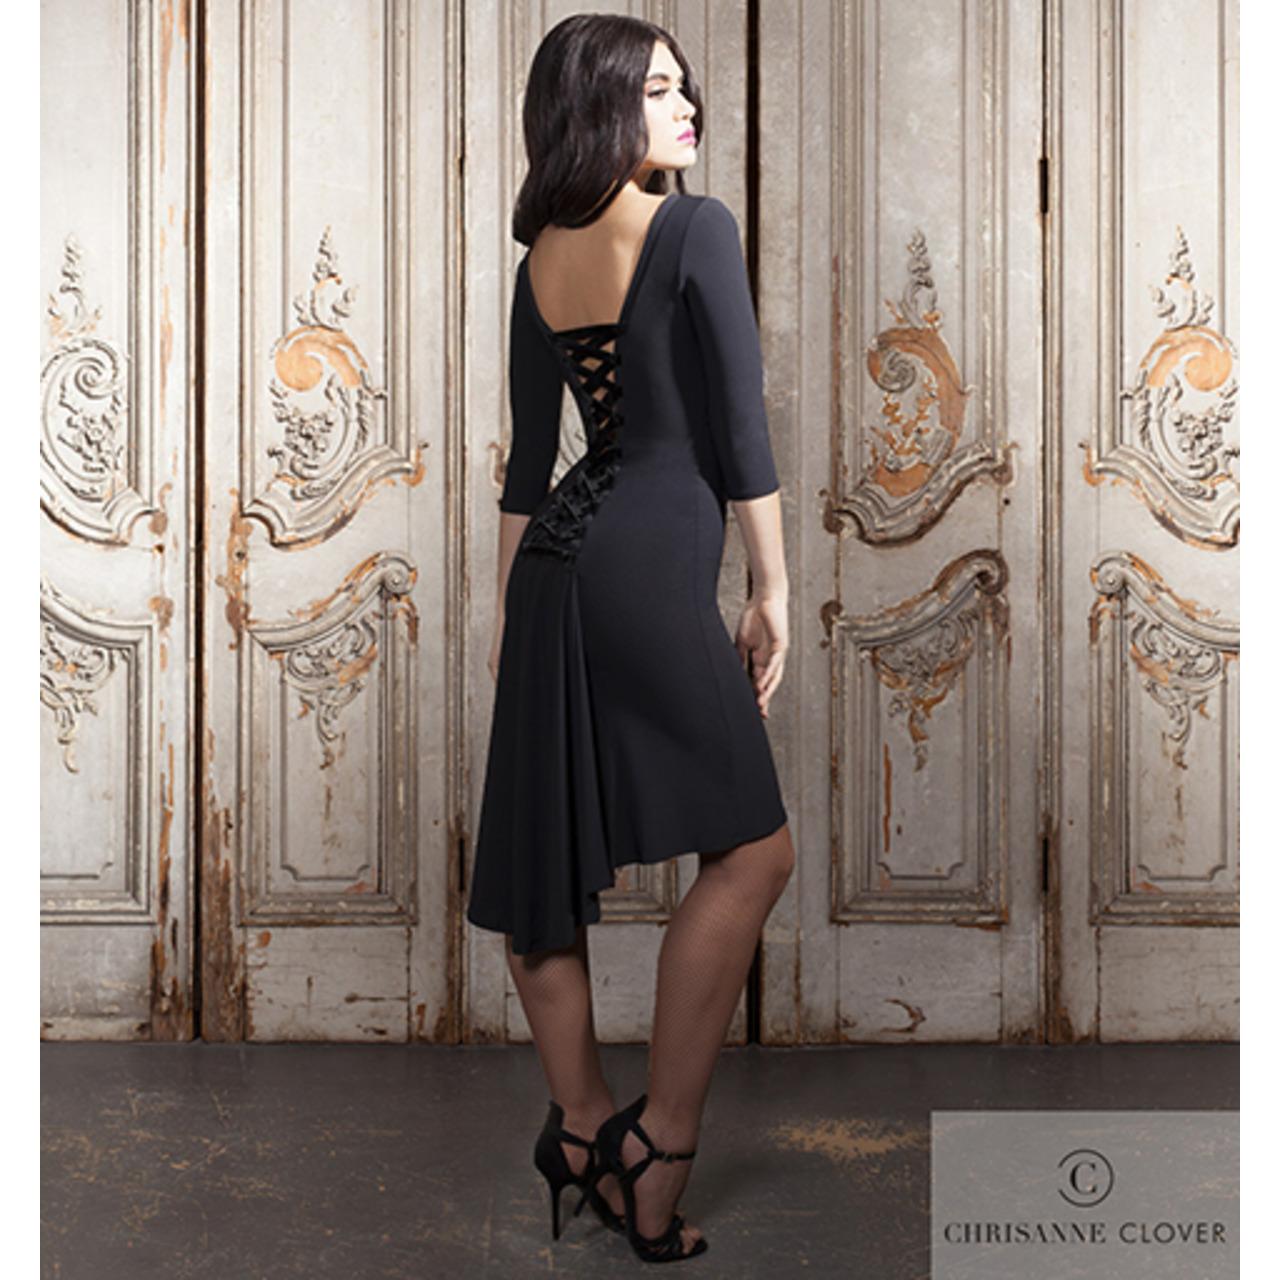 BROOKLYN LATIN DRESS (Платье для Аргентинского танго или латинской практики)